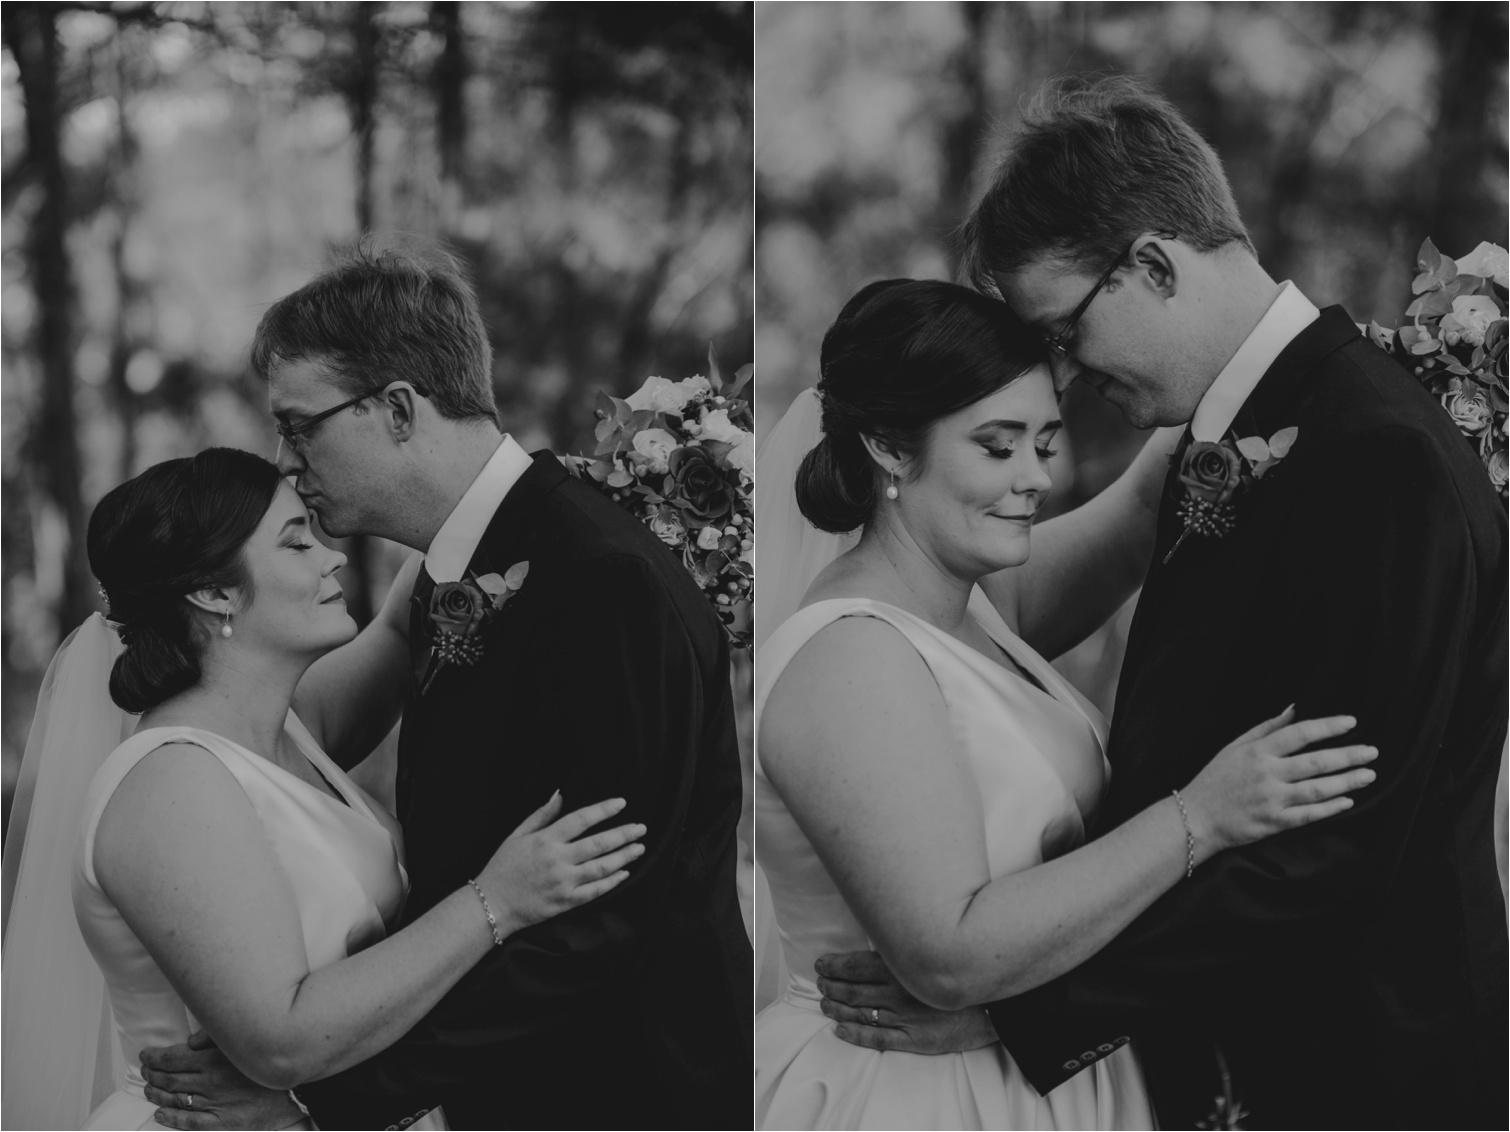 Bribie_Island_Black_and_White_Wedding_Photography